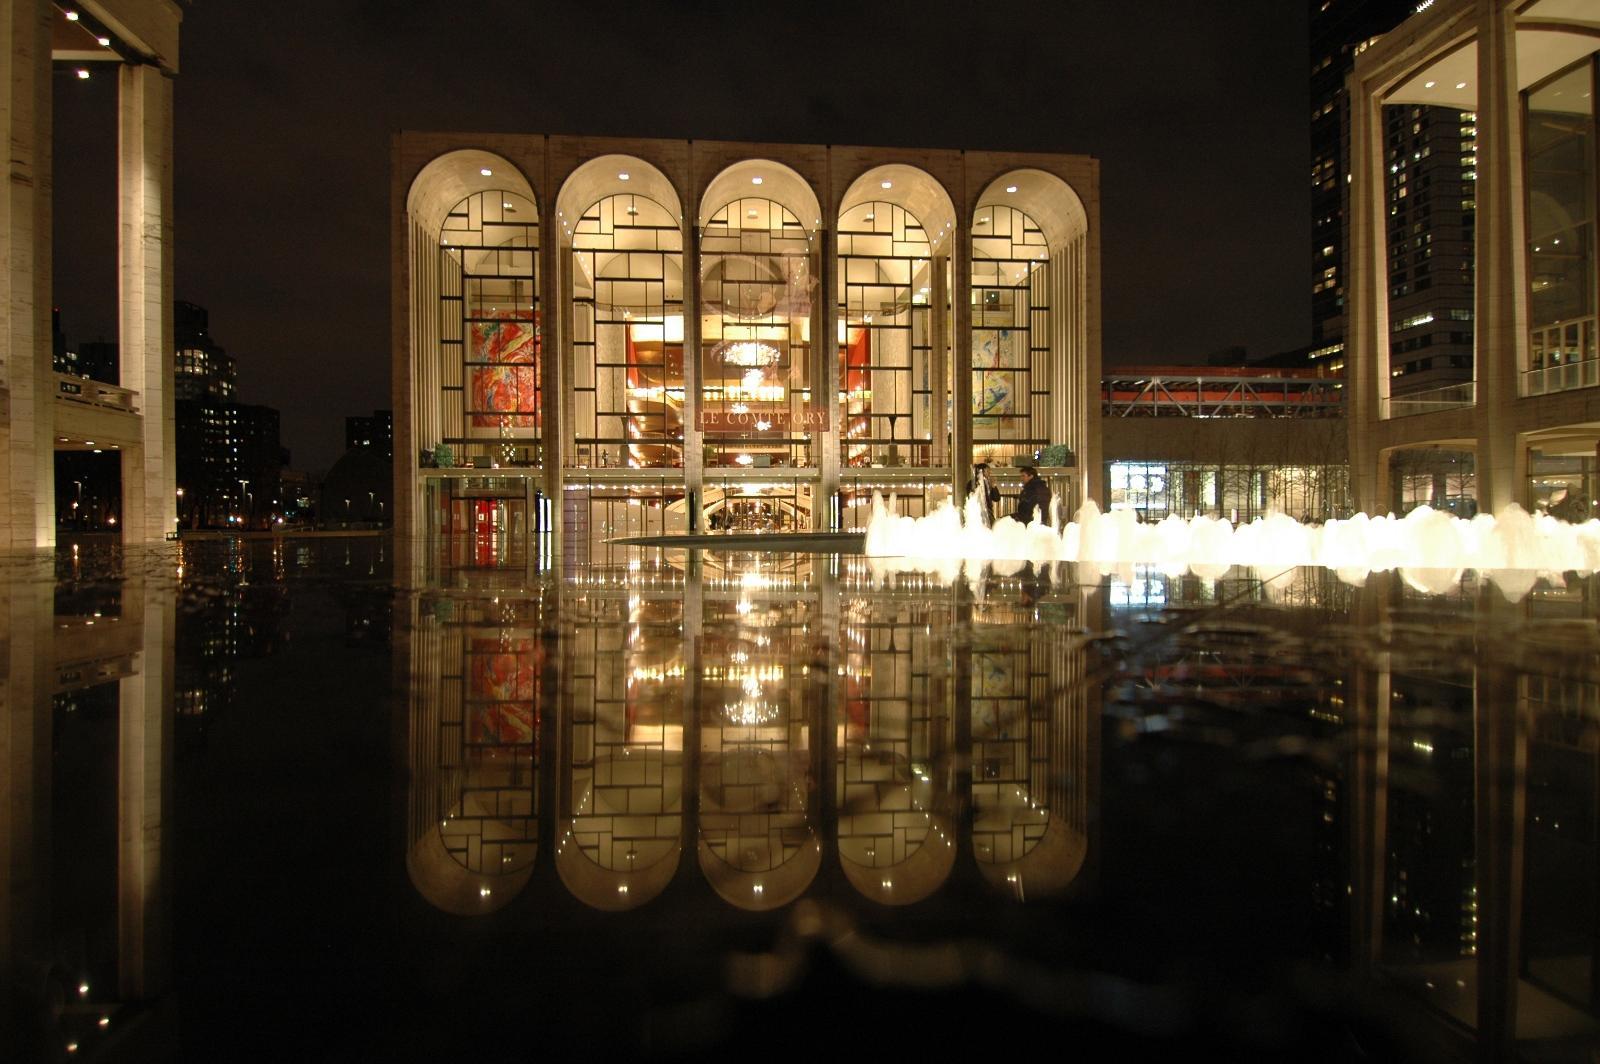 David Rubenstein Pavilion at Lincoln Center